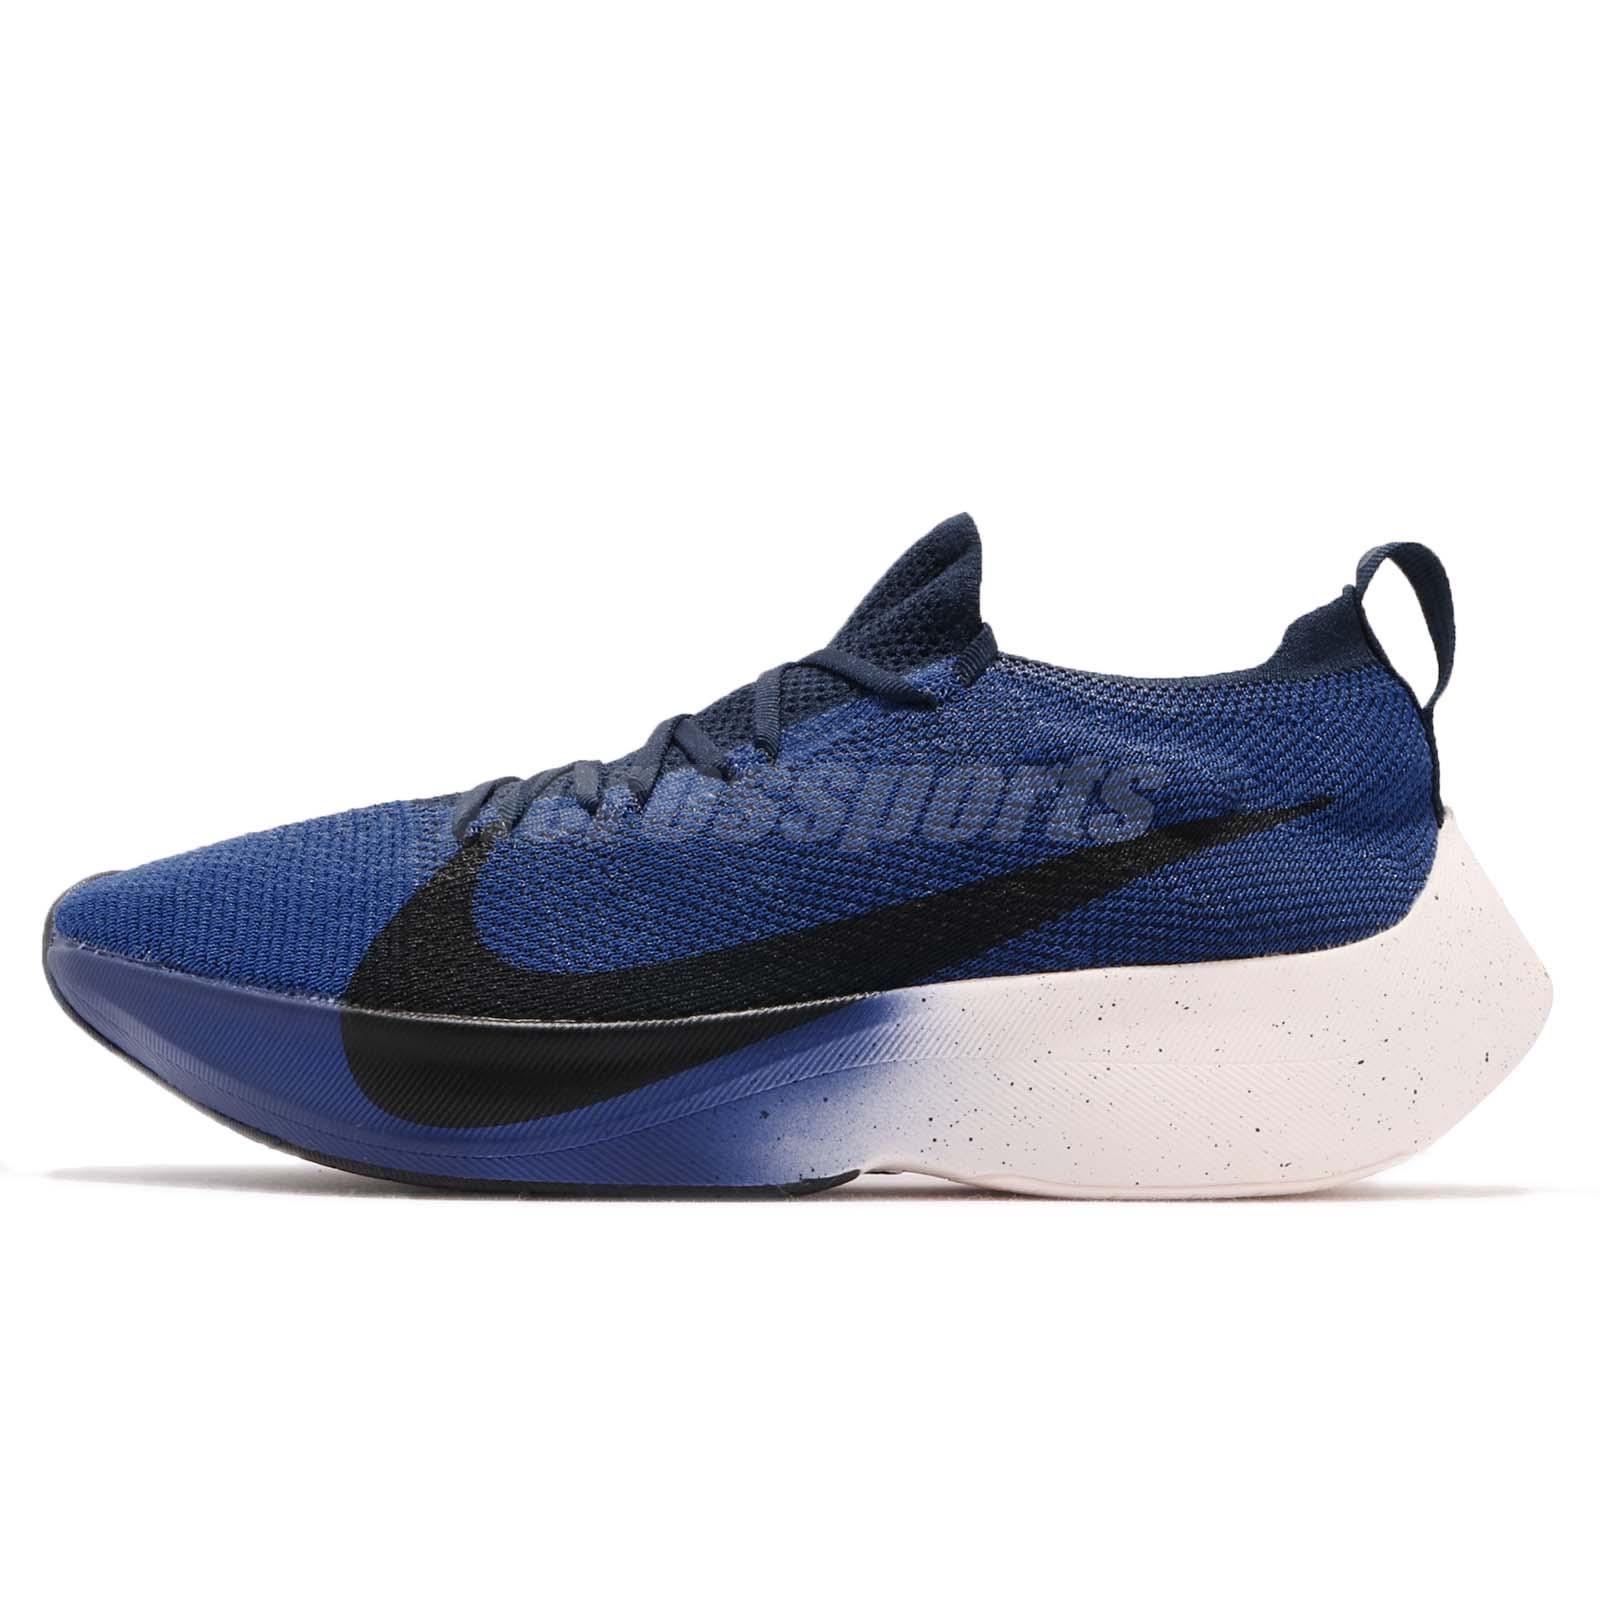 online store 60e6c 0ed21 Nike REACT Vapor Street Flyknit Big Swoosh Blue Black Running Shoes  AQ1763-400